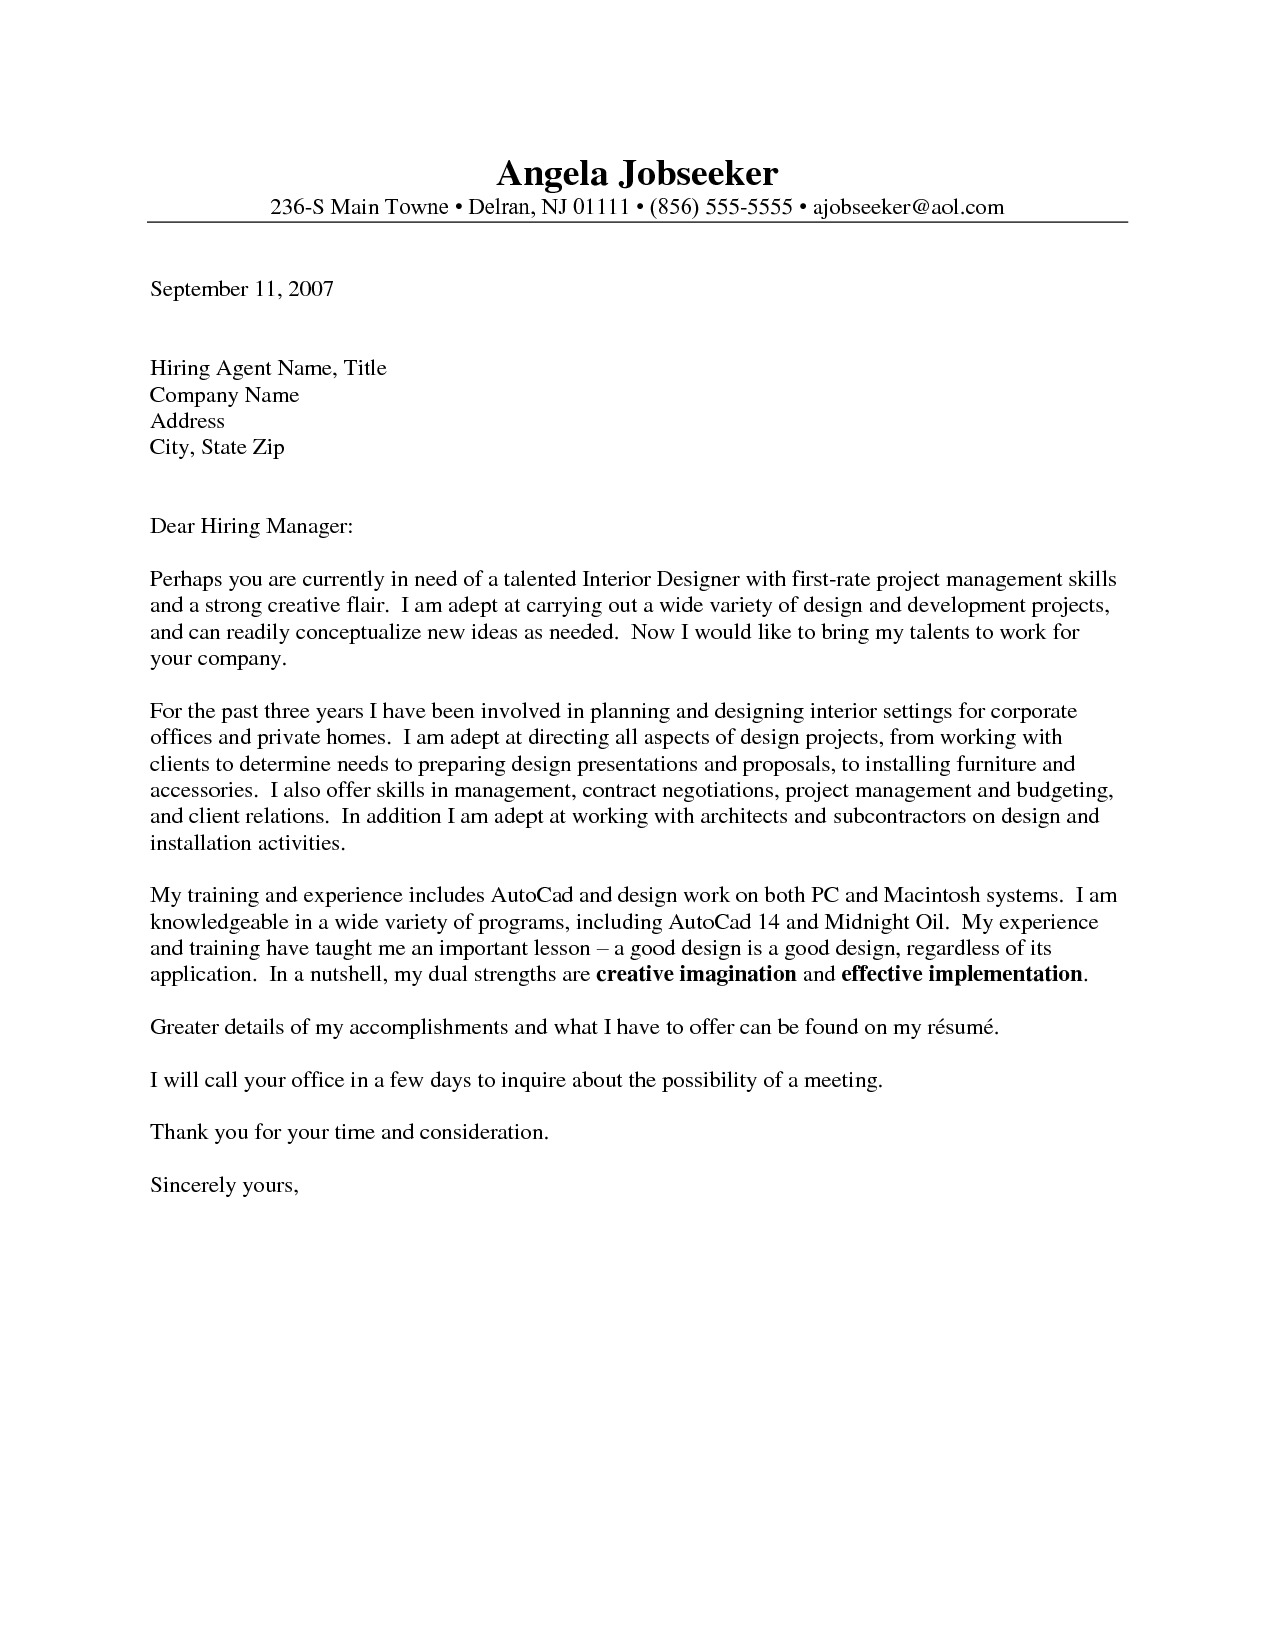 job cover letter outline